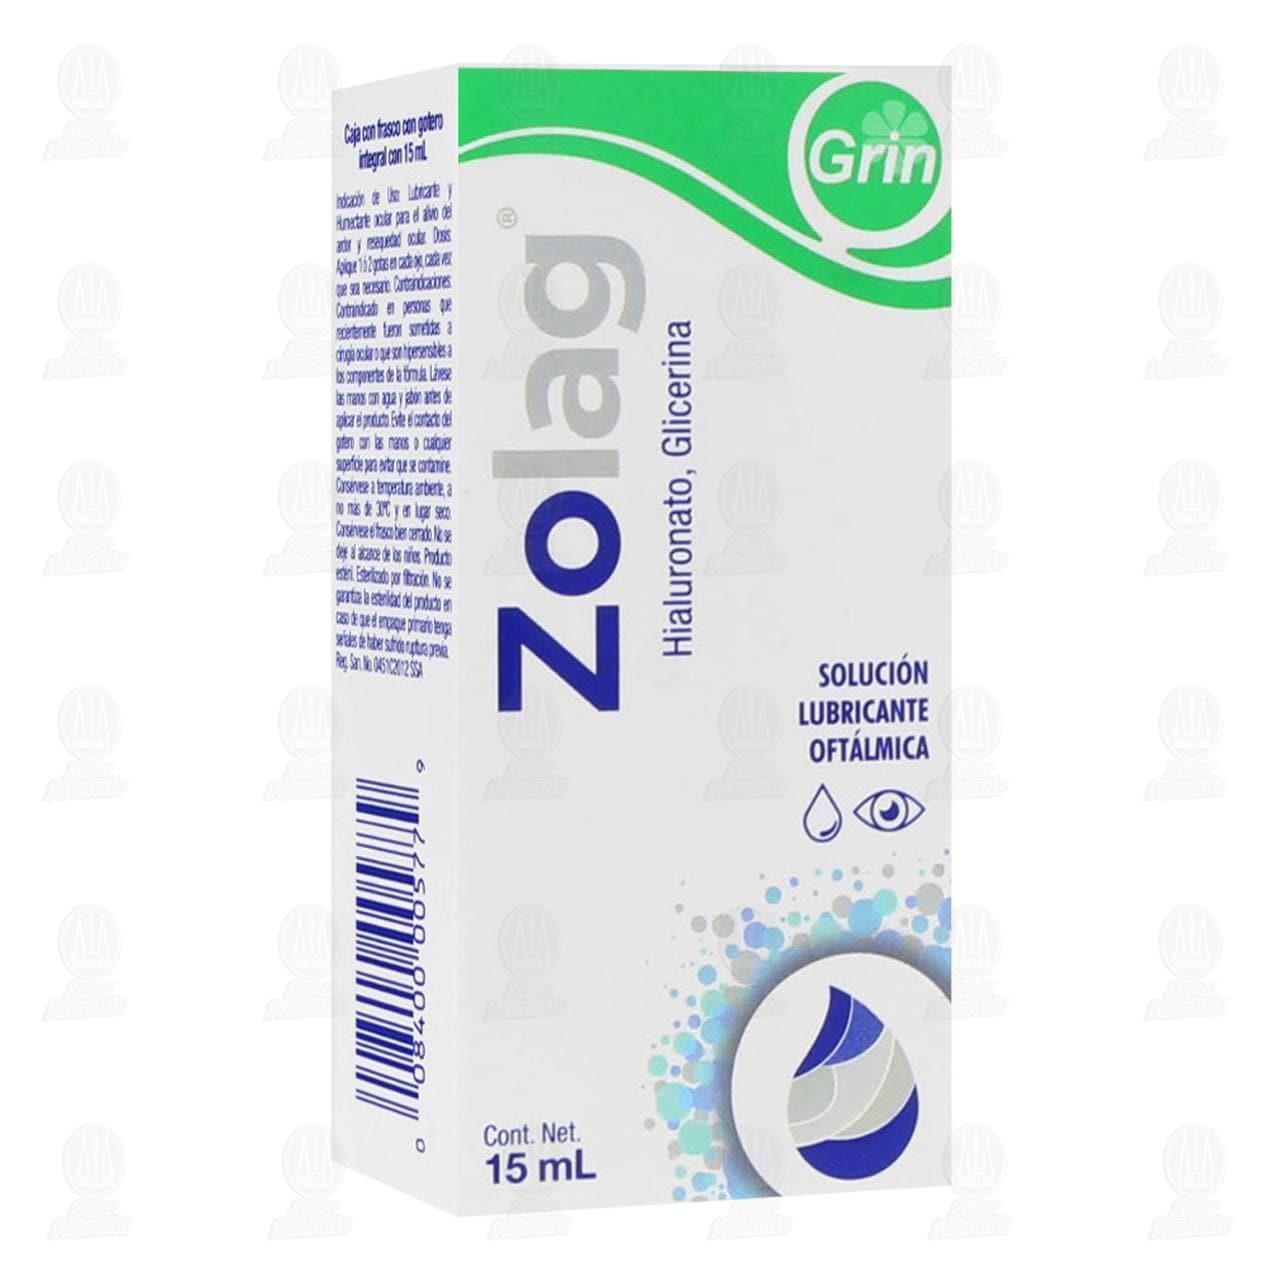 Comprar Zolag 15ml Solución Oftálmica Lubricante en Farmacias Guadalajara